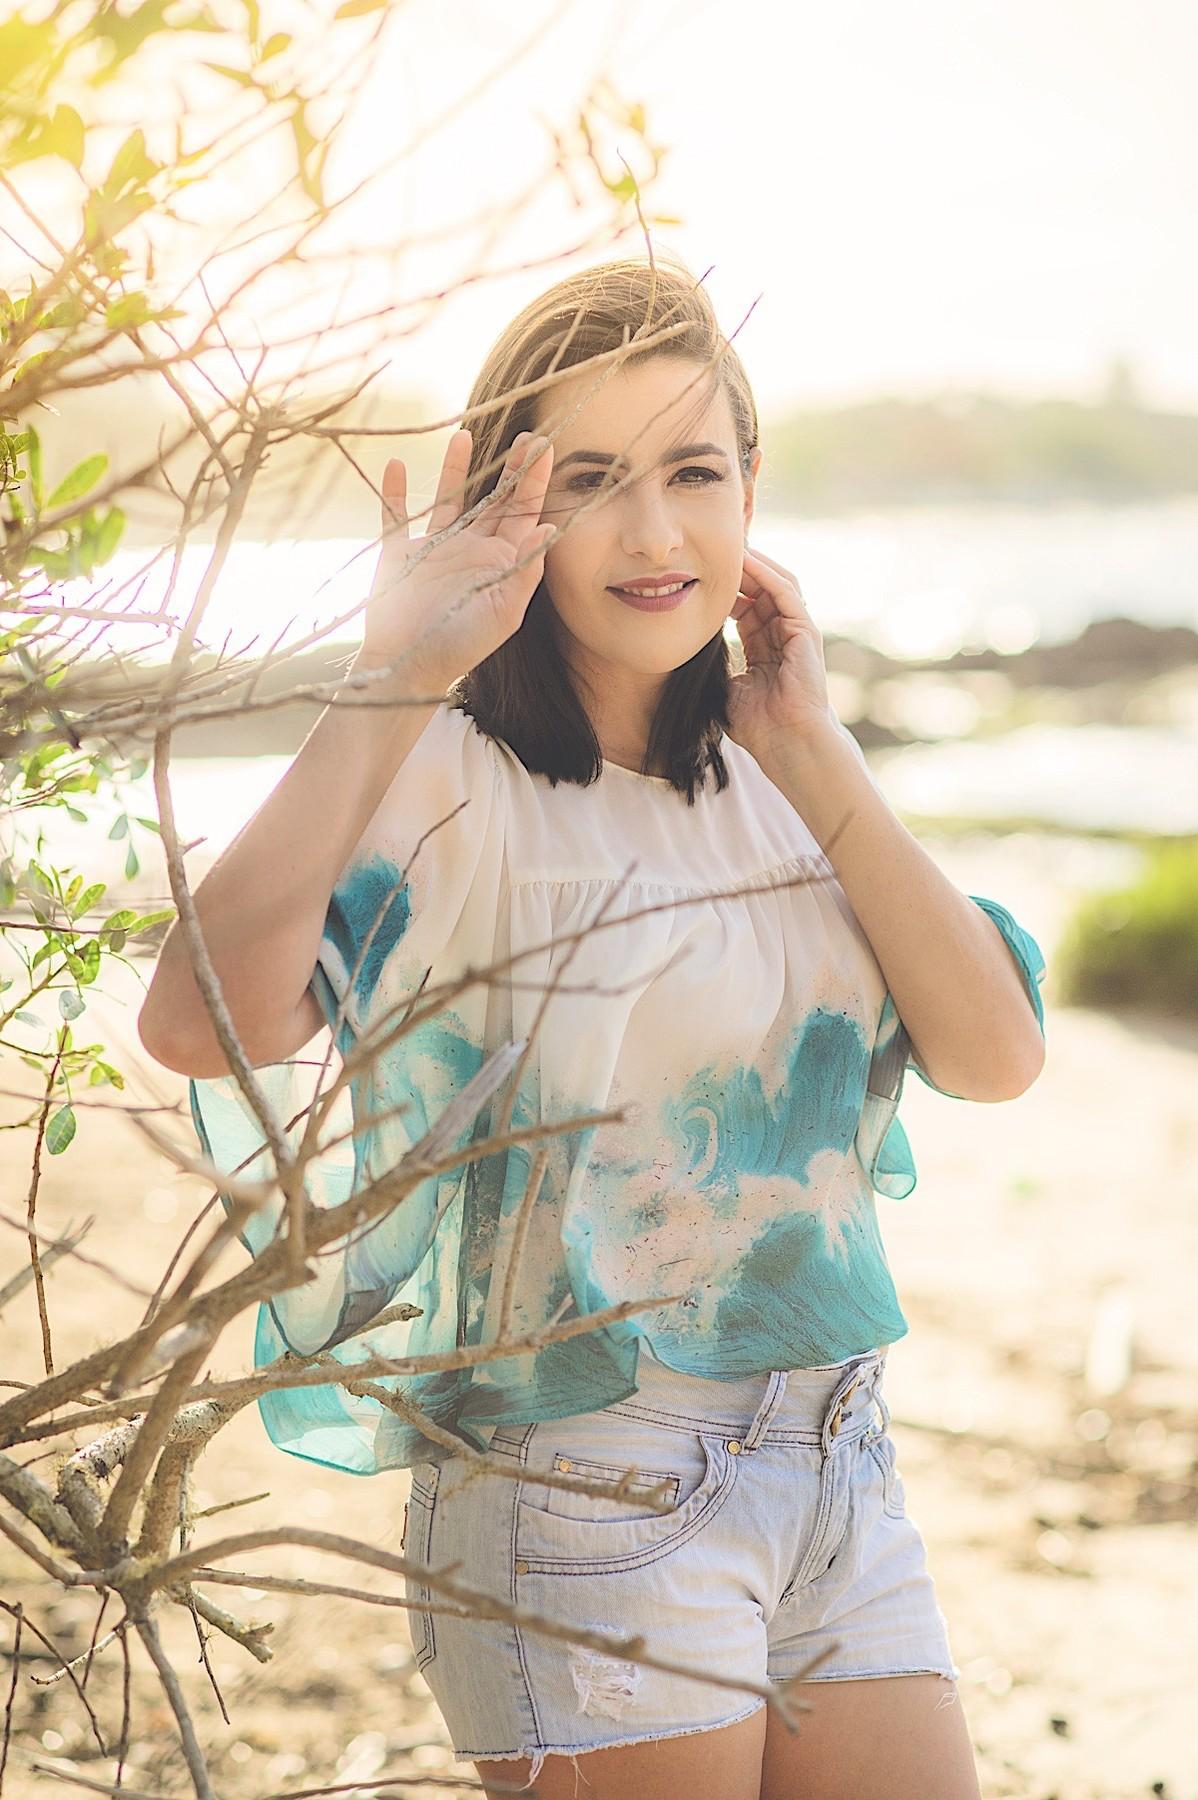 fabiana silva - chroma fotografia - ensaio na praia - book feminino - penha - sc